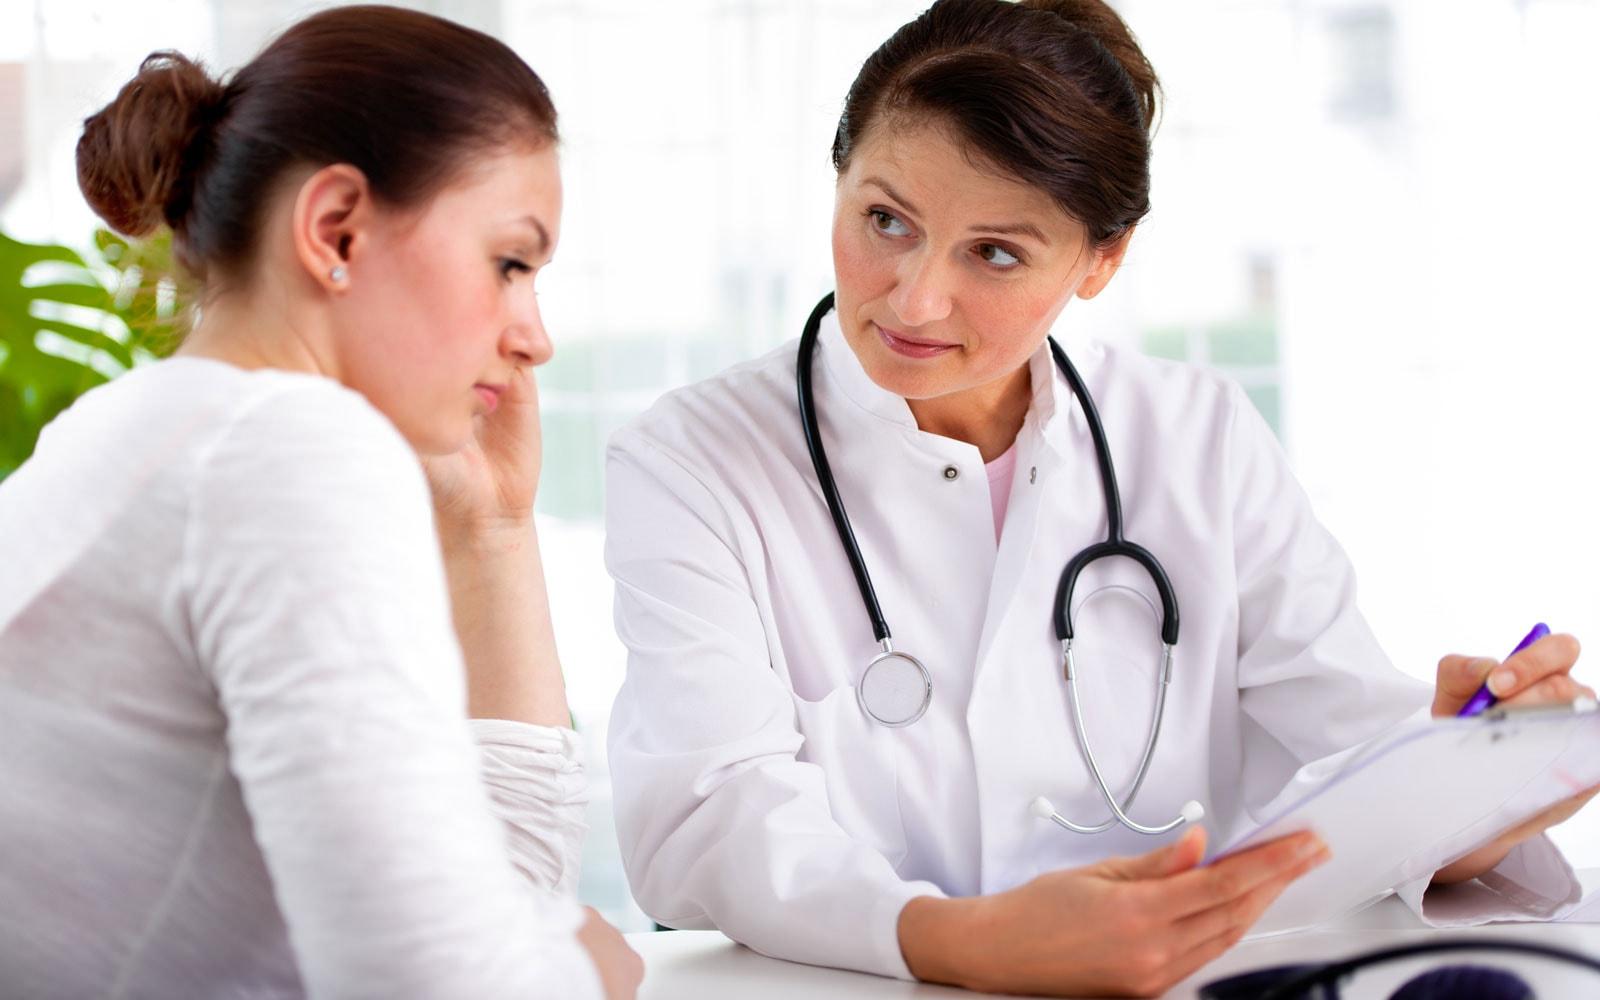 Psichiatro, dietologo, neurologo, FMR gydytoto (reabilitologo) konsultacijas kompensuoja Vilniaus teritorinė ligonių kasa